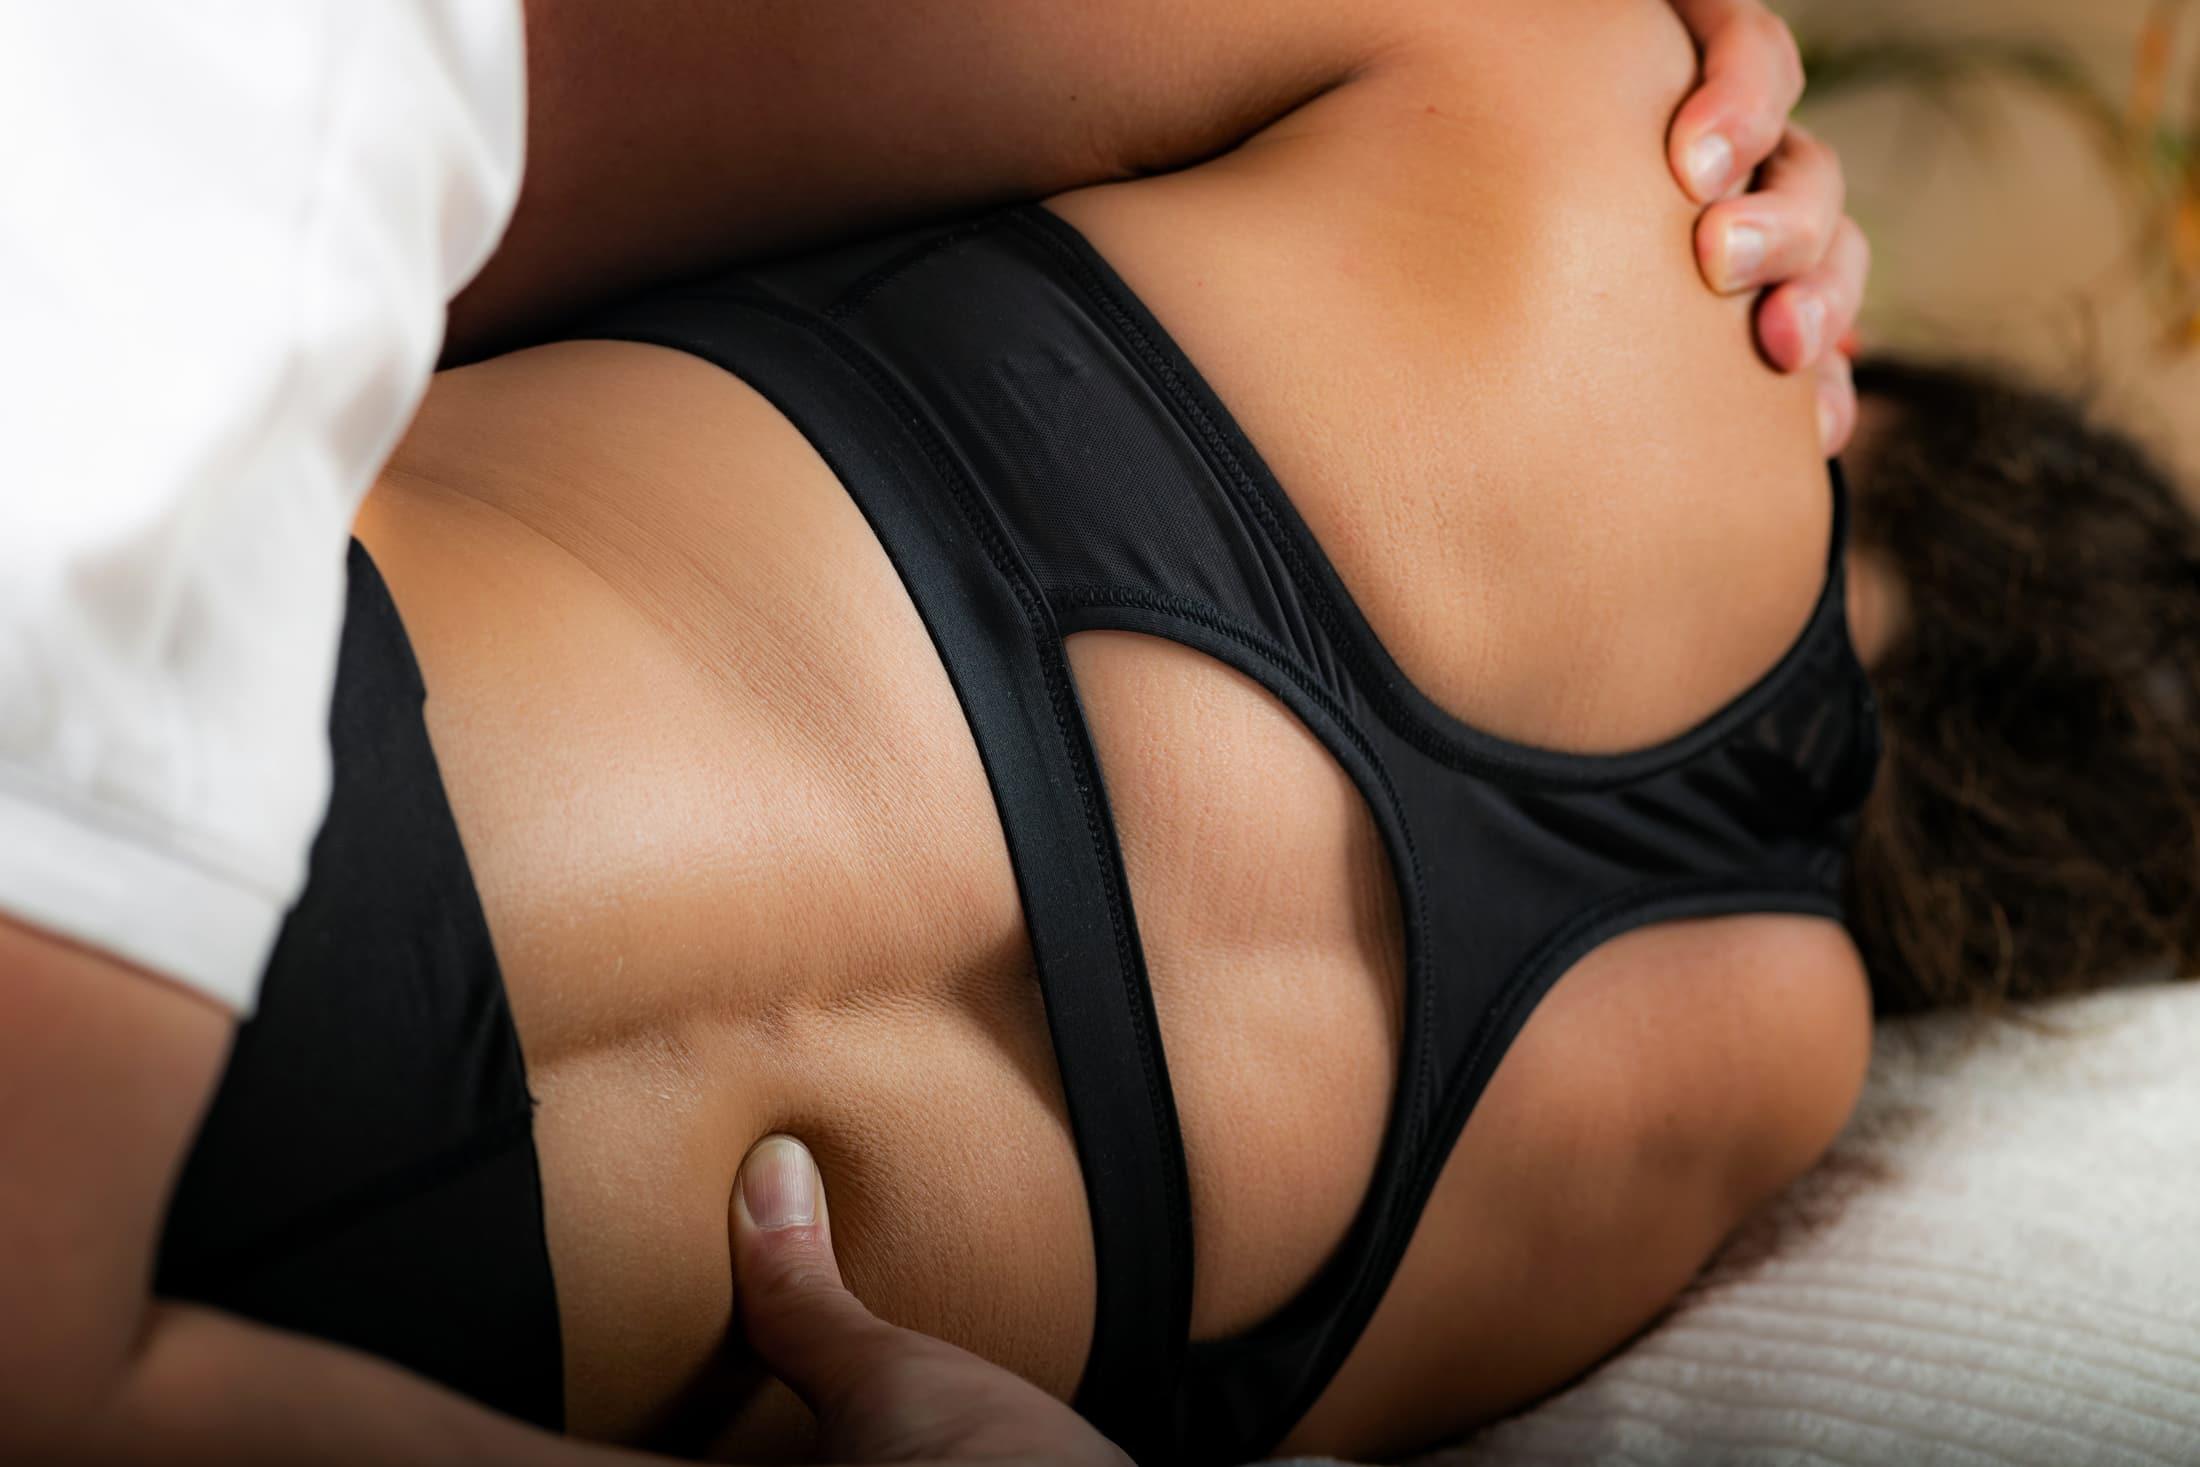 osteopathy treatment spinal manipulation PM6BTXL